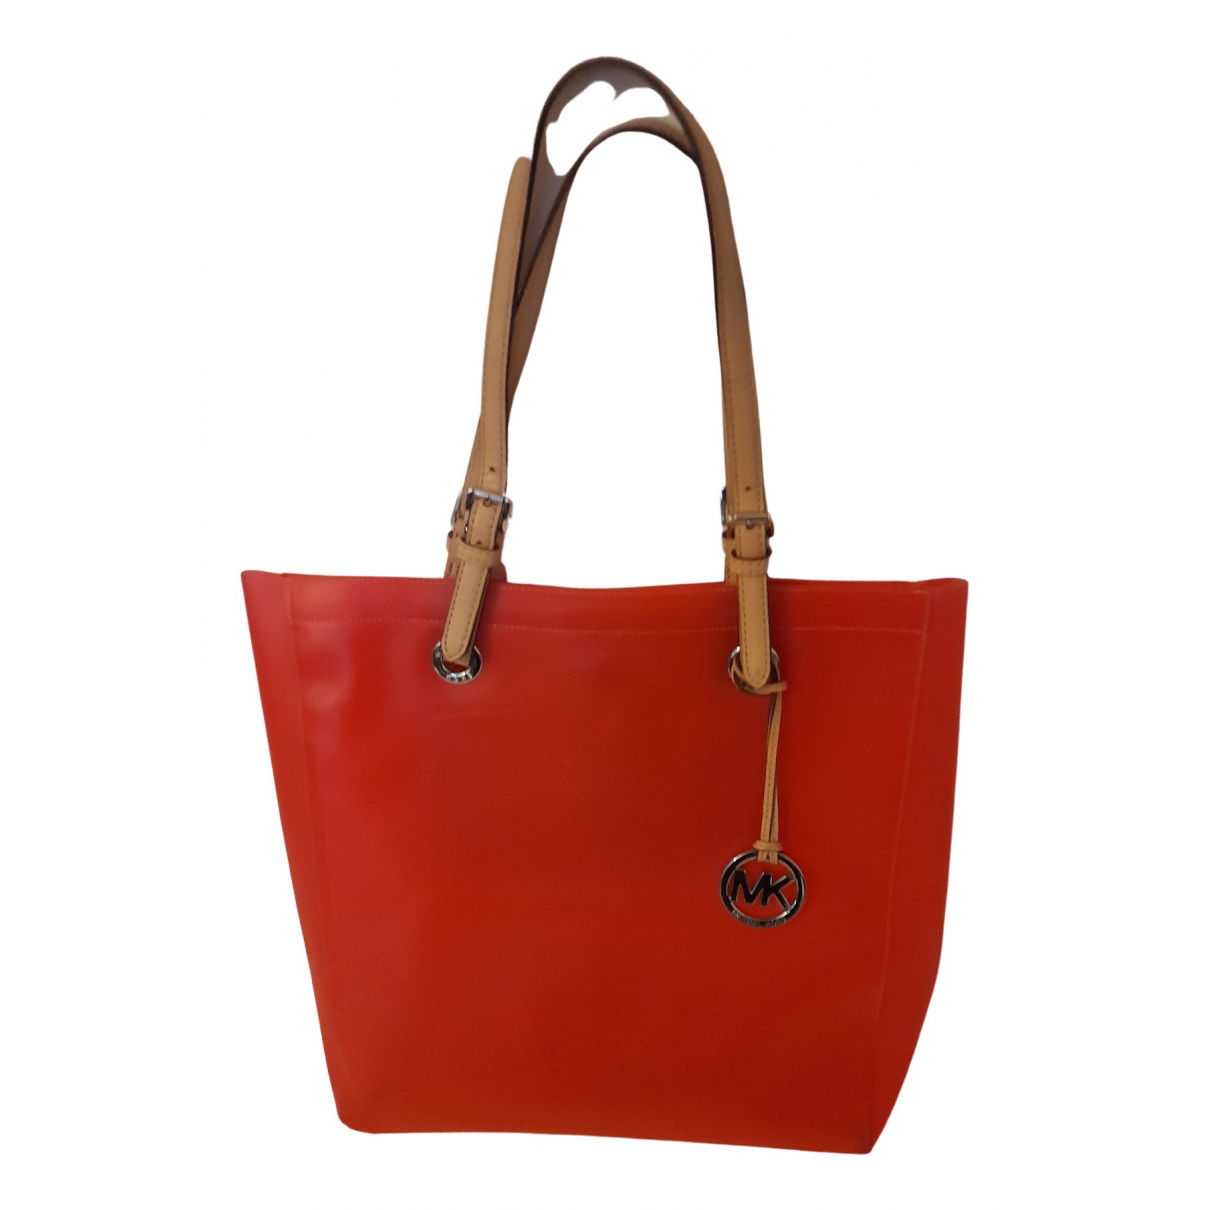 Michael Kors N Pink handbag for Women N